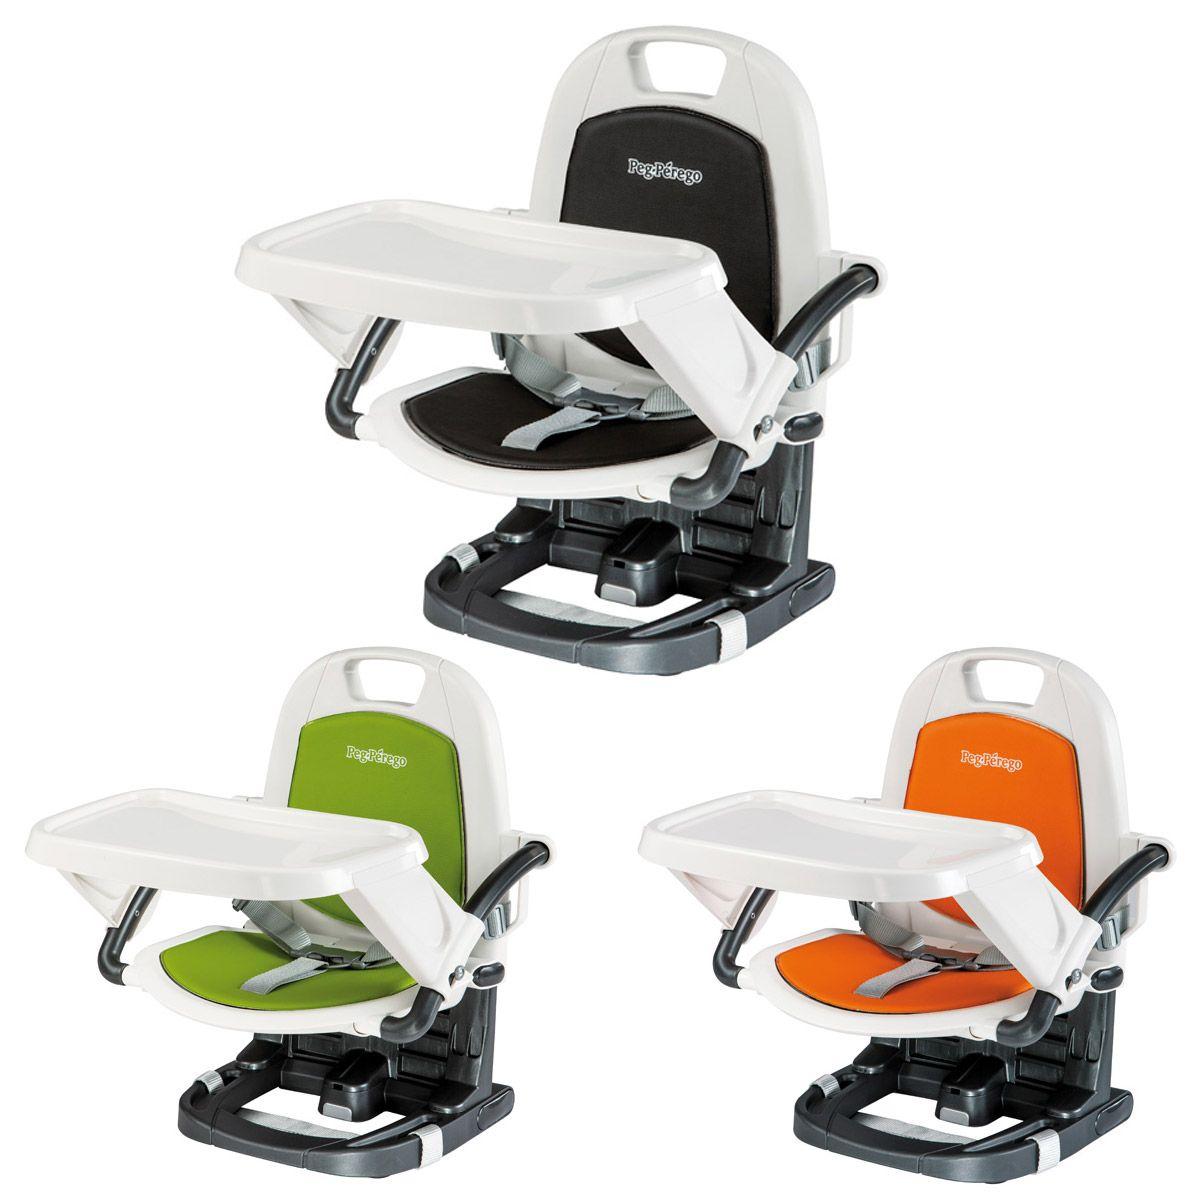 Peg Perego Rialto Booster Seat | BabyRecs | Pinterest | Peg perego ...